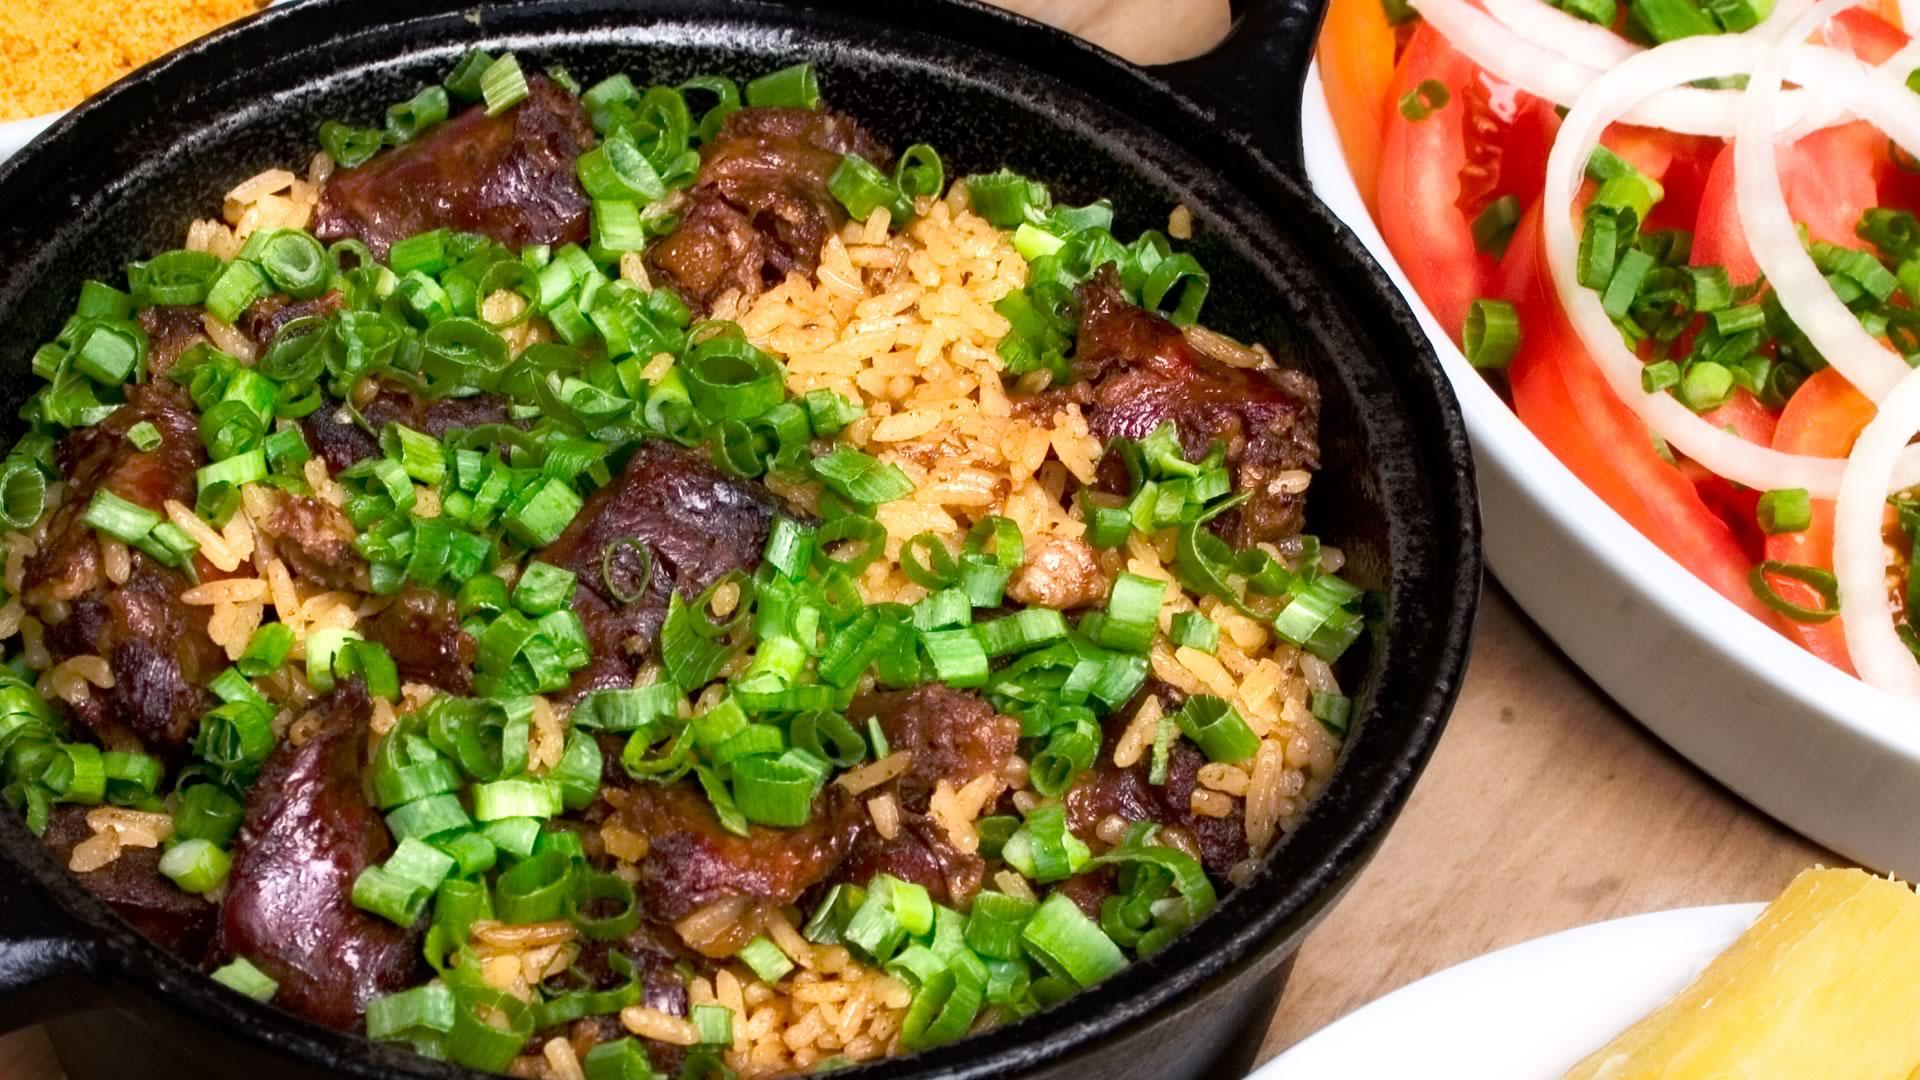 Linguiça de Maracaju com arroz